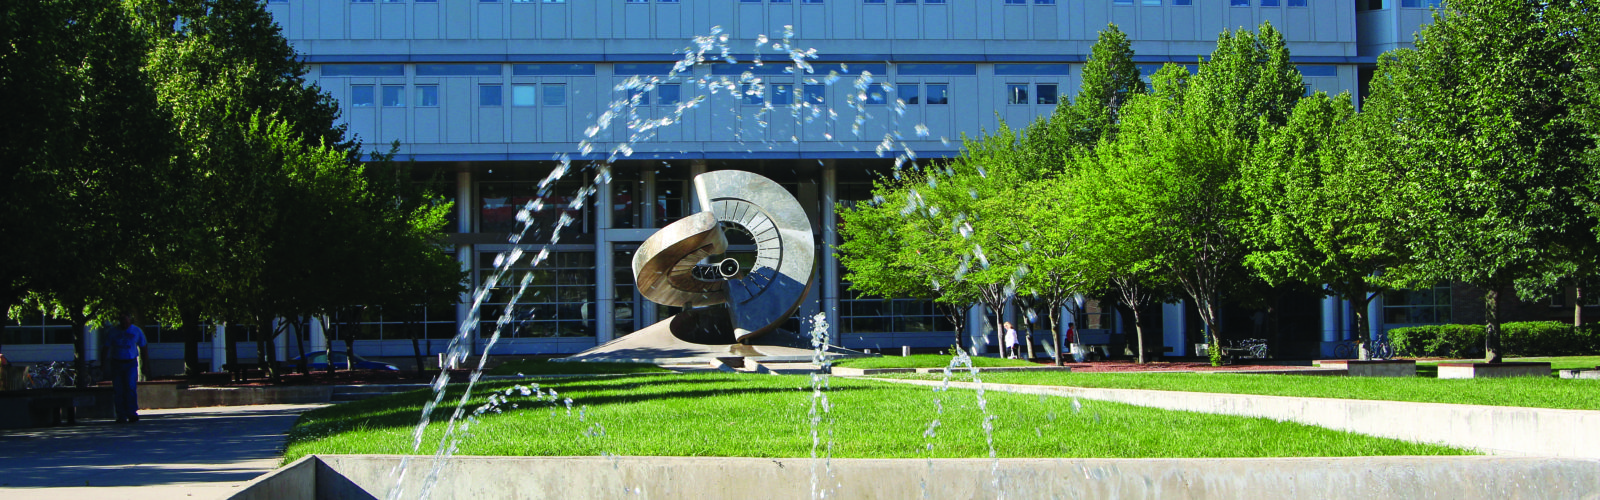 Engineering hall and mall